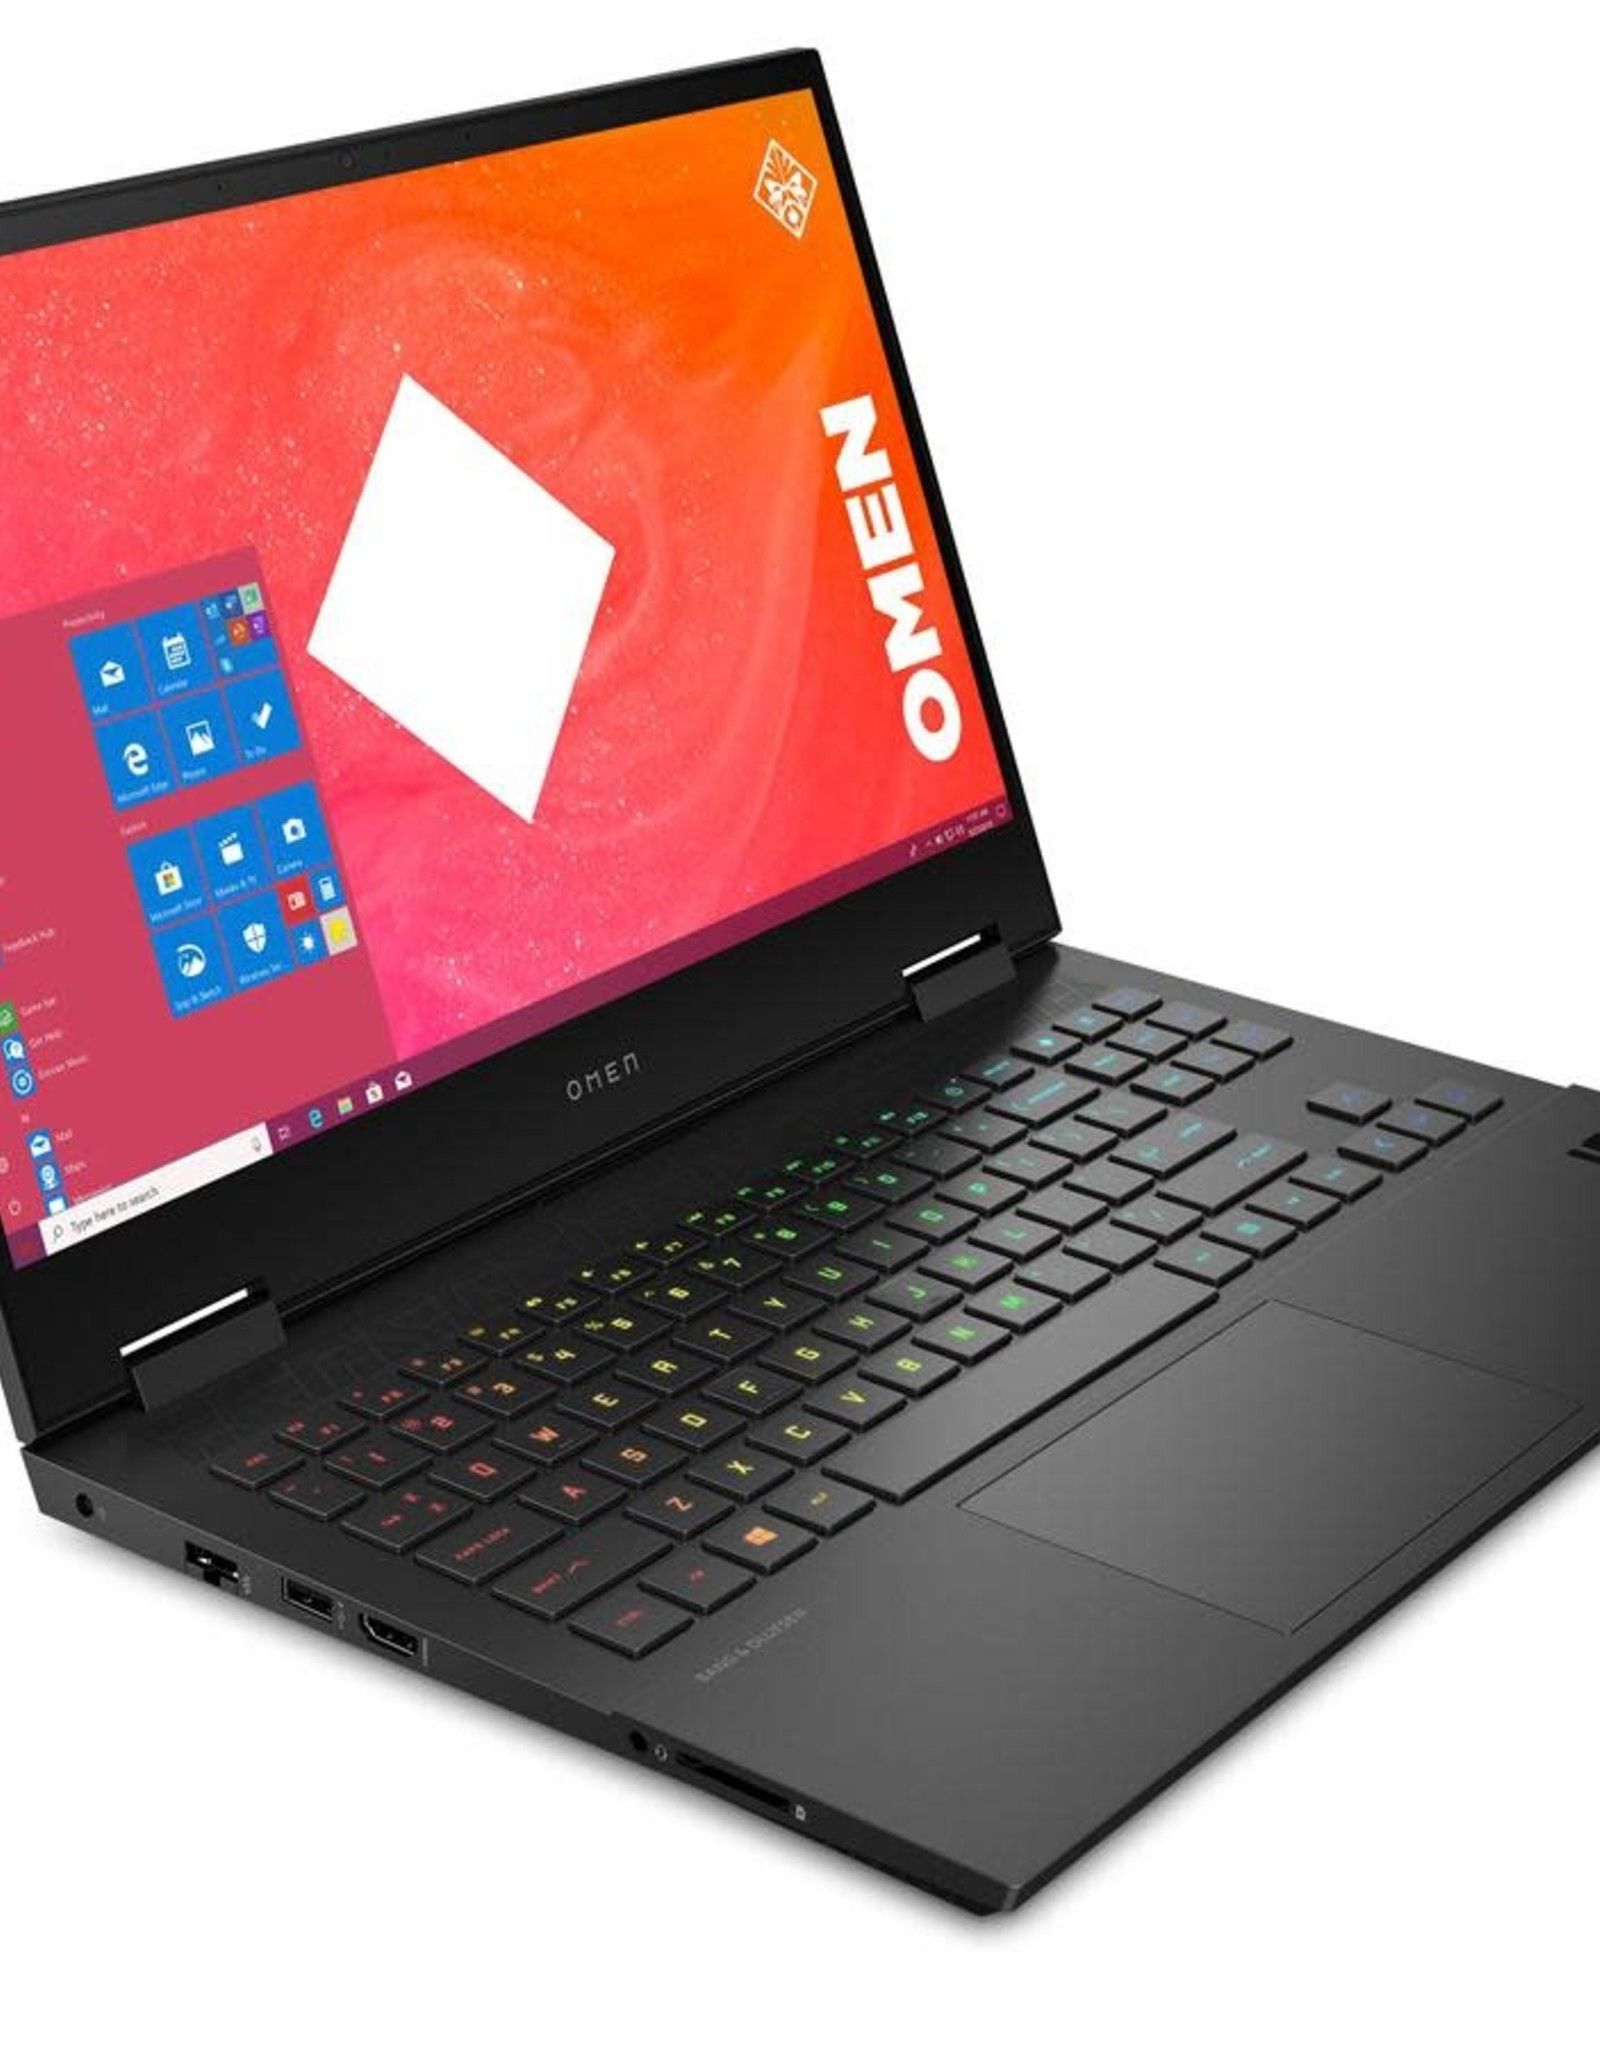 "HP HP | OMEN 15.6"" Gaming Laptop - Black Intel i7-10750H 512GB M.2 SSD 16GB GeForce RTX 2060 | 15-ek0008ca"